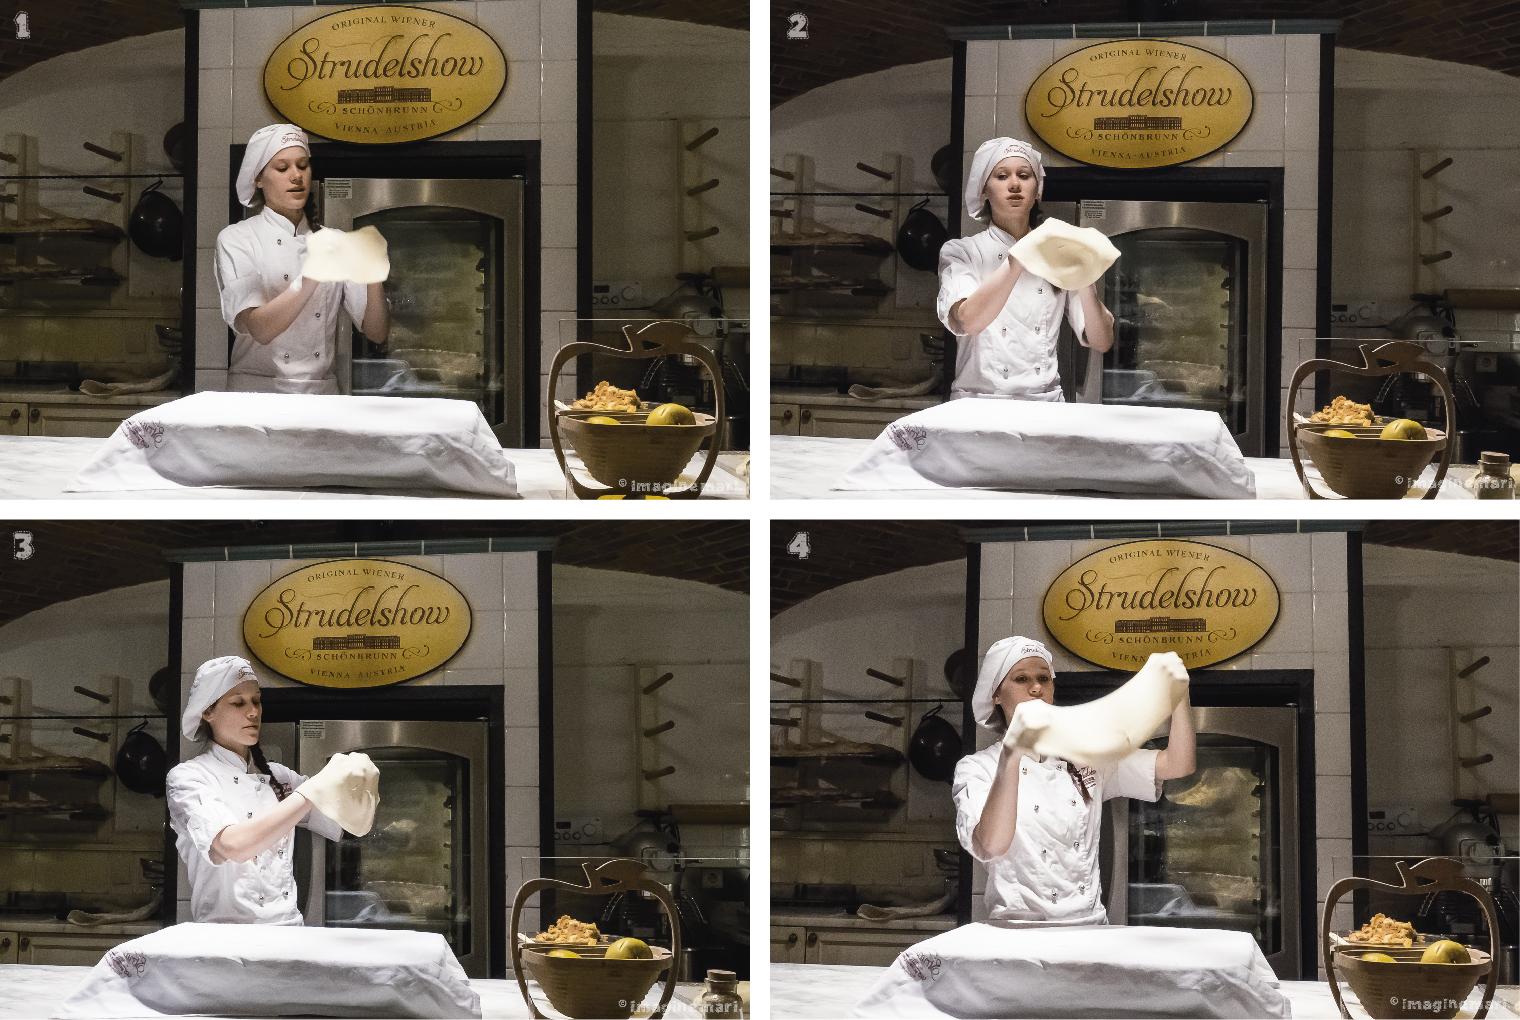 apple_strudel_dough_stretching-steps-01